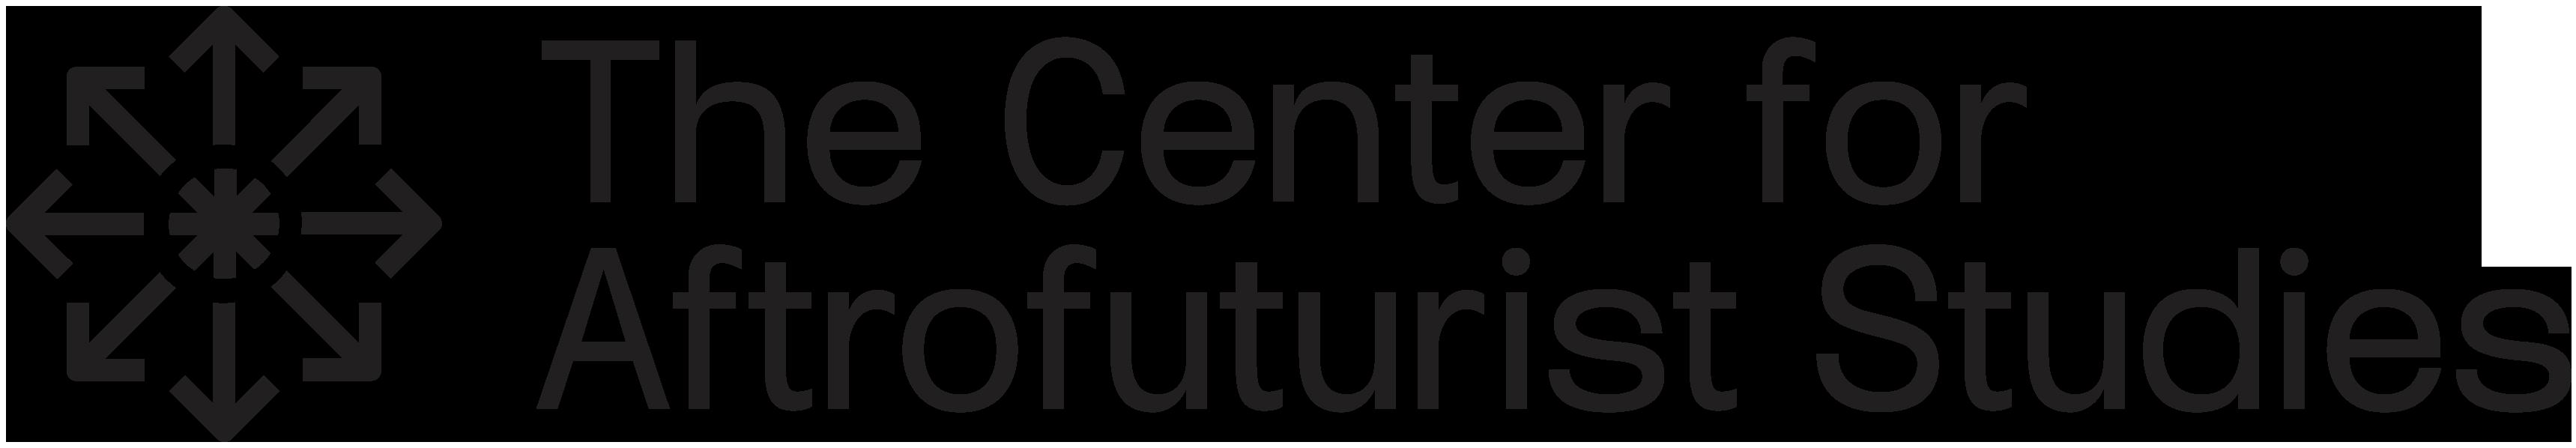 The Center for Afrofuturist Studies